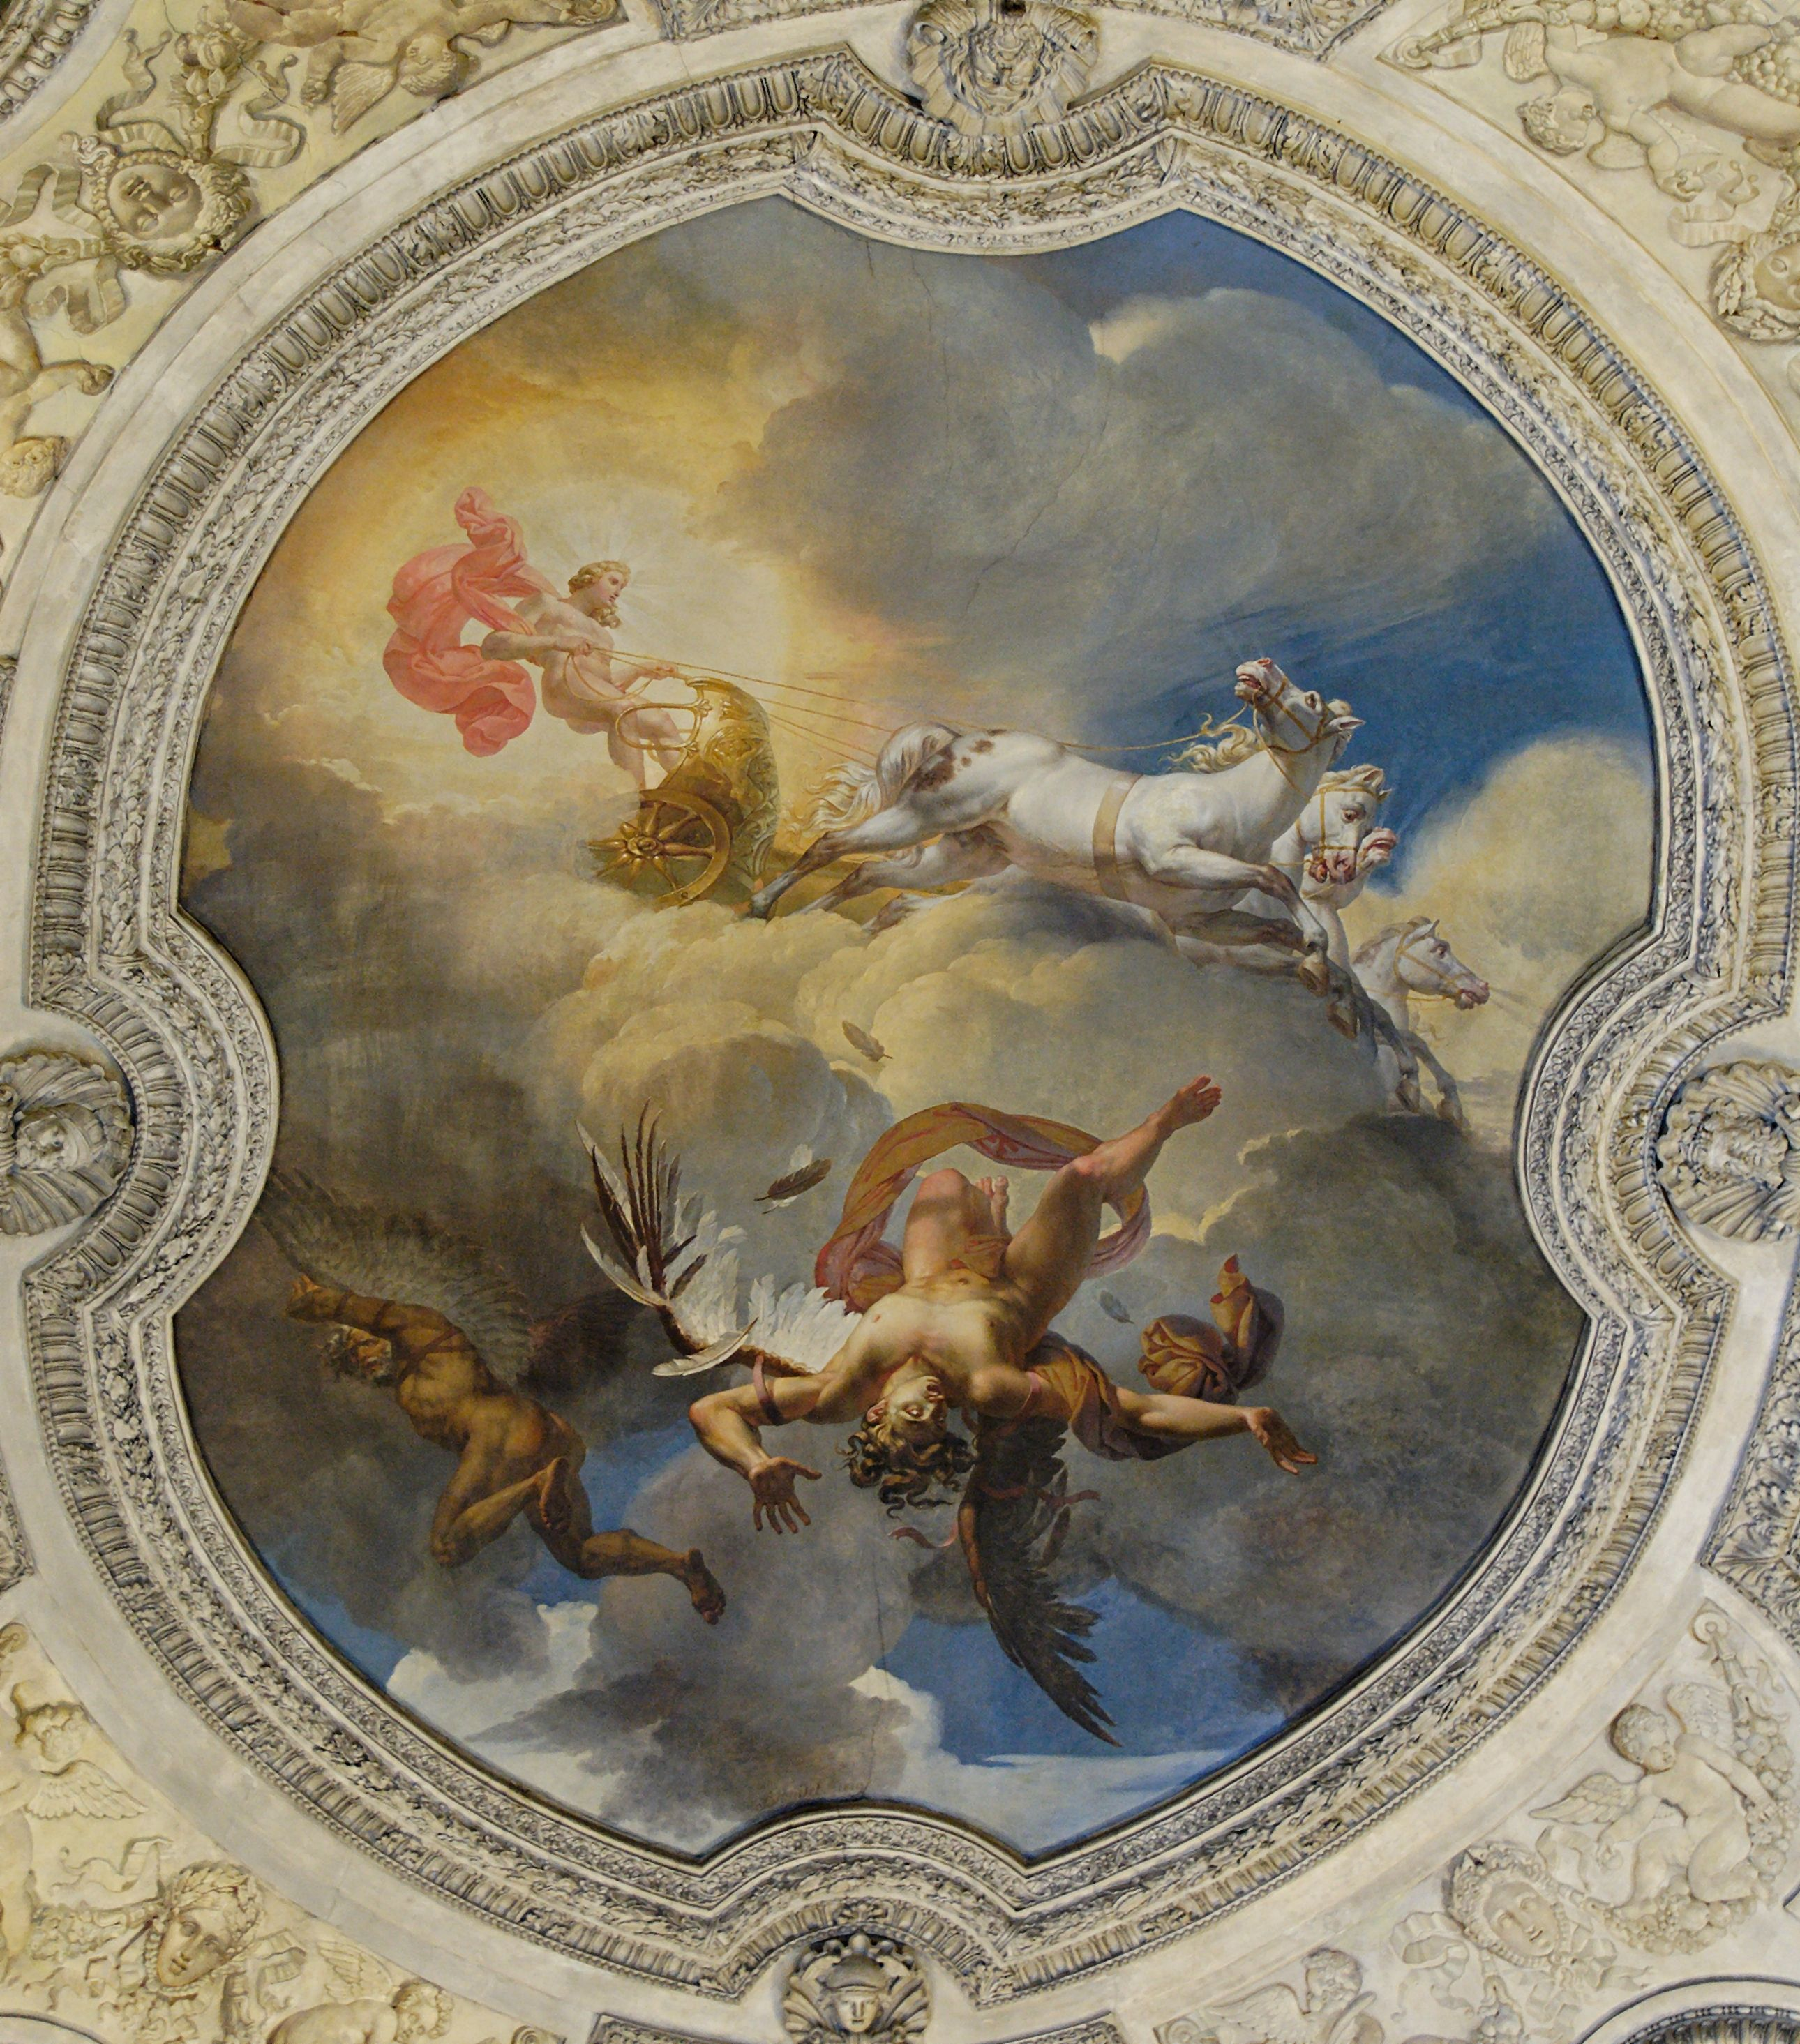 Talk:Icarus